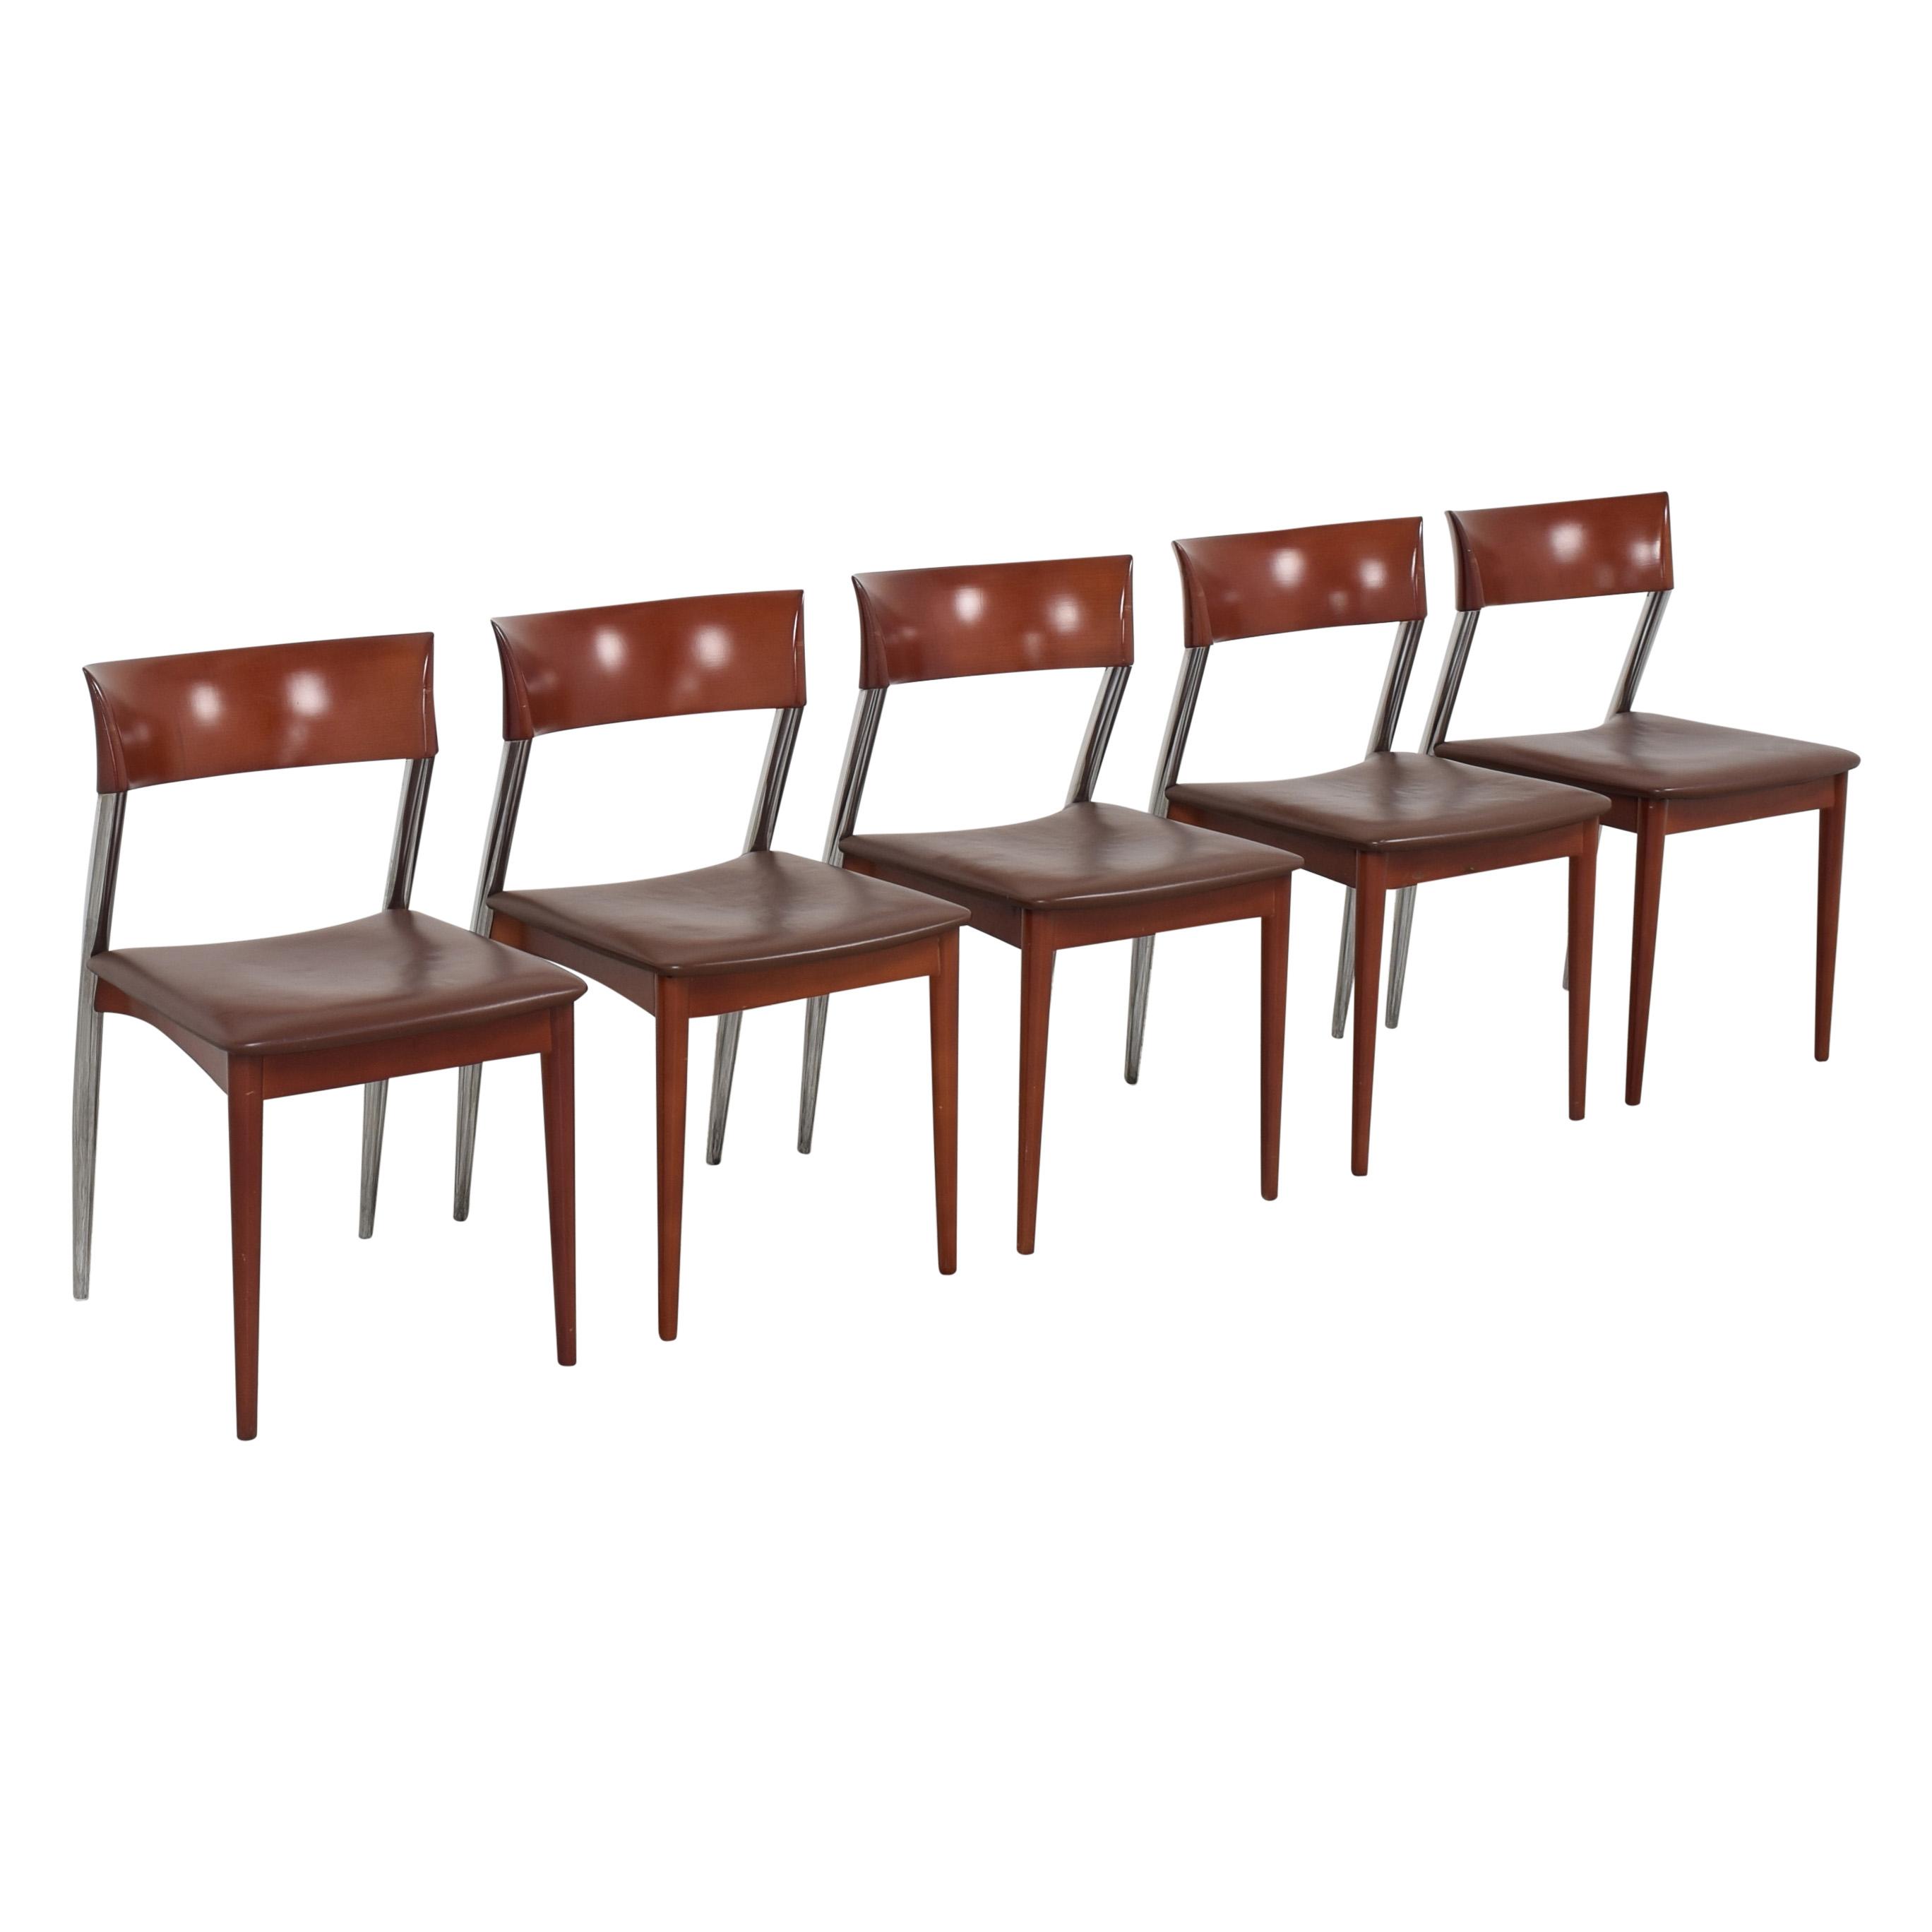 Loewenstein Loewenstein Dining Chairs Dining Chairs